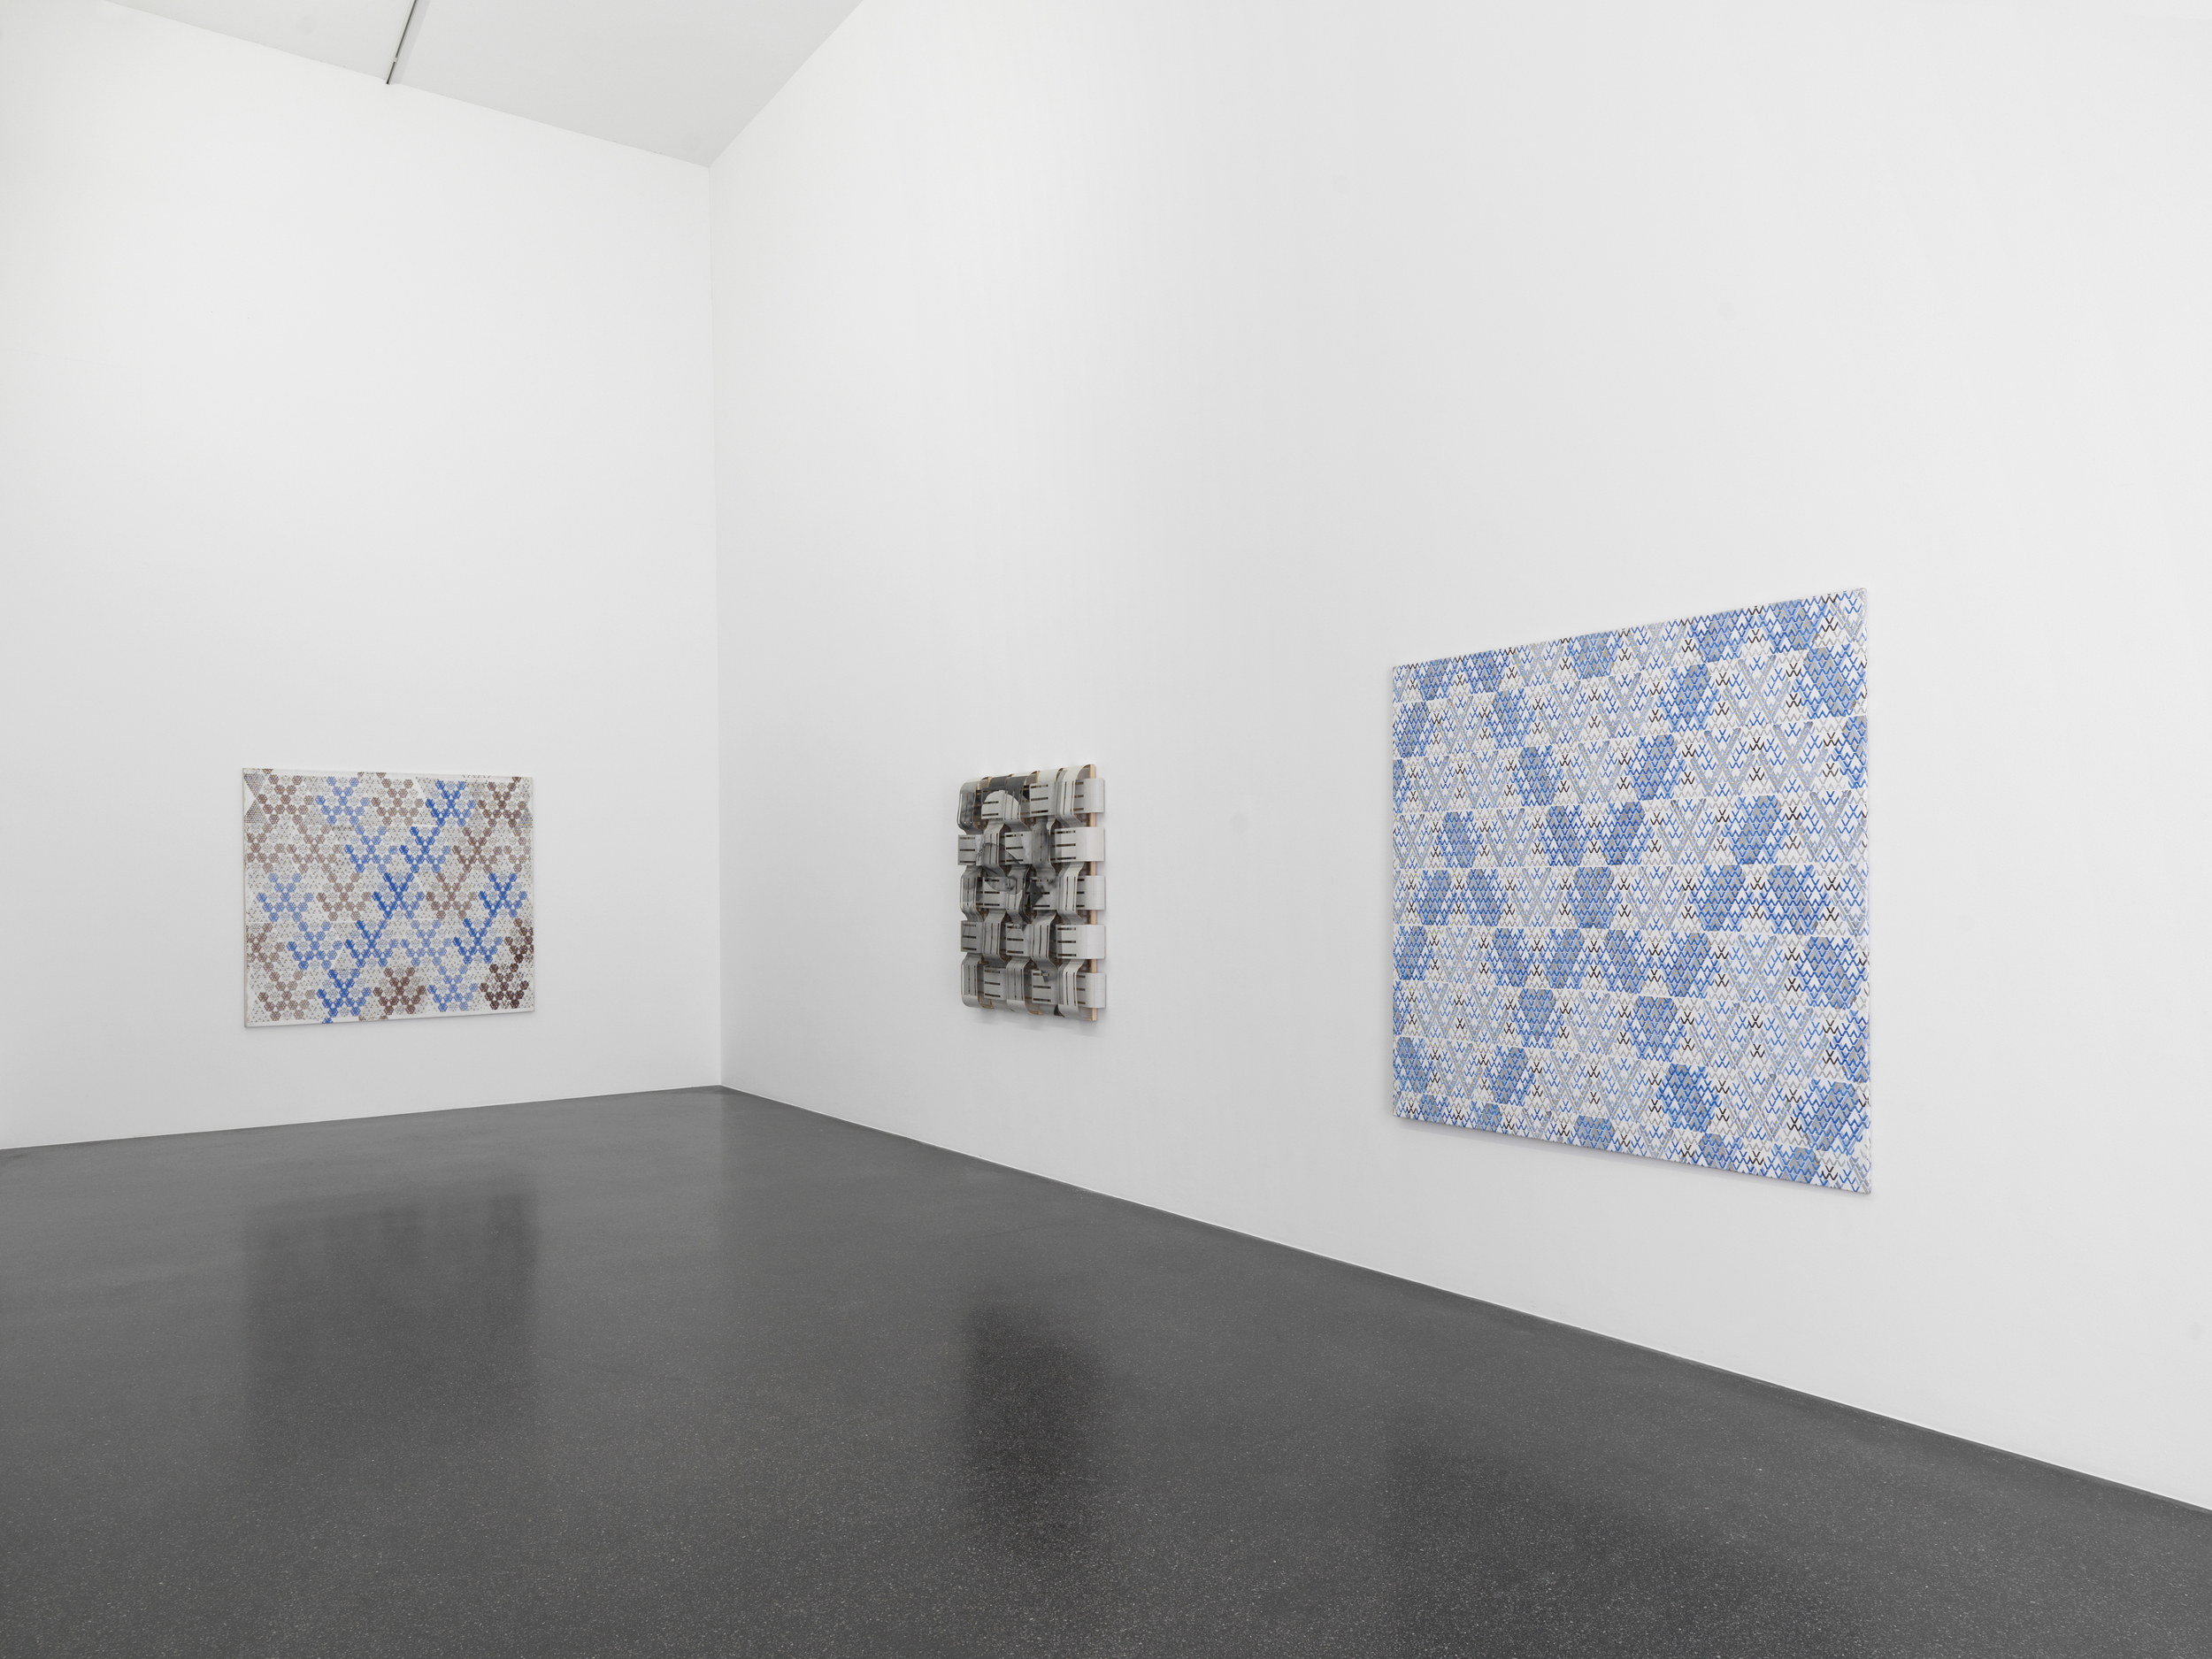 Galerie Francesca Pia, Zurich   Thomas Bayerle   2014